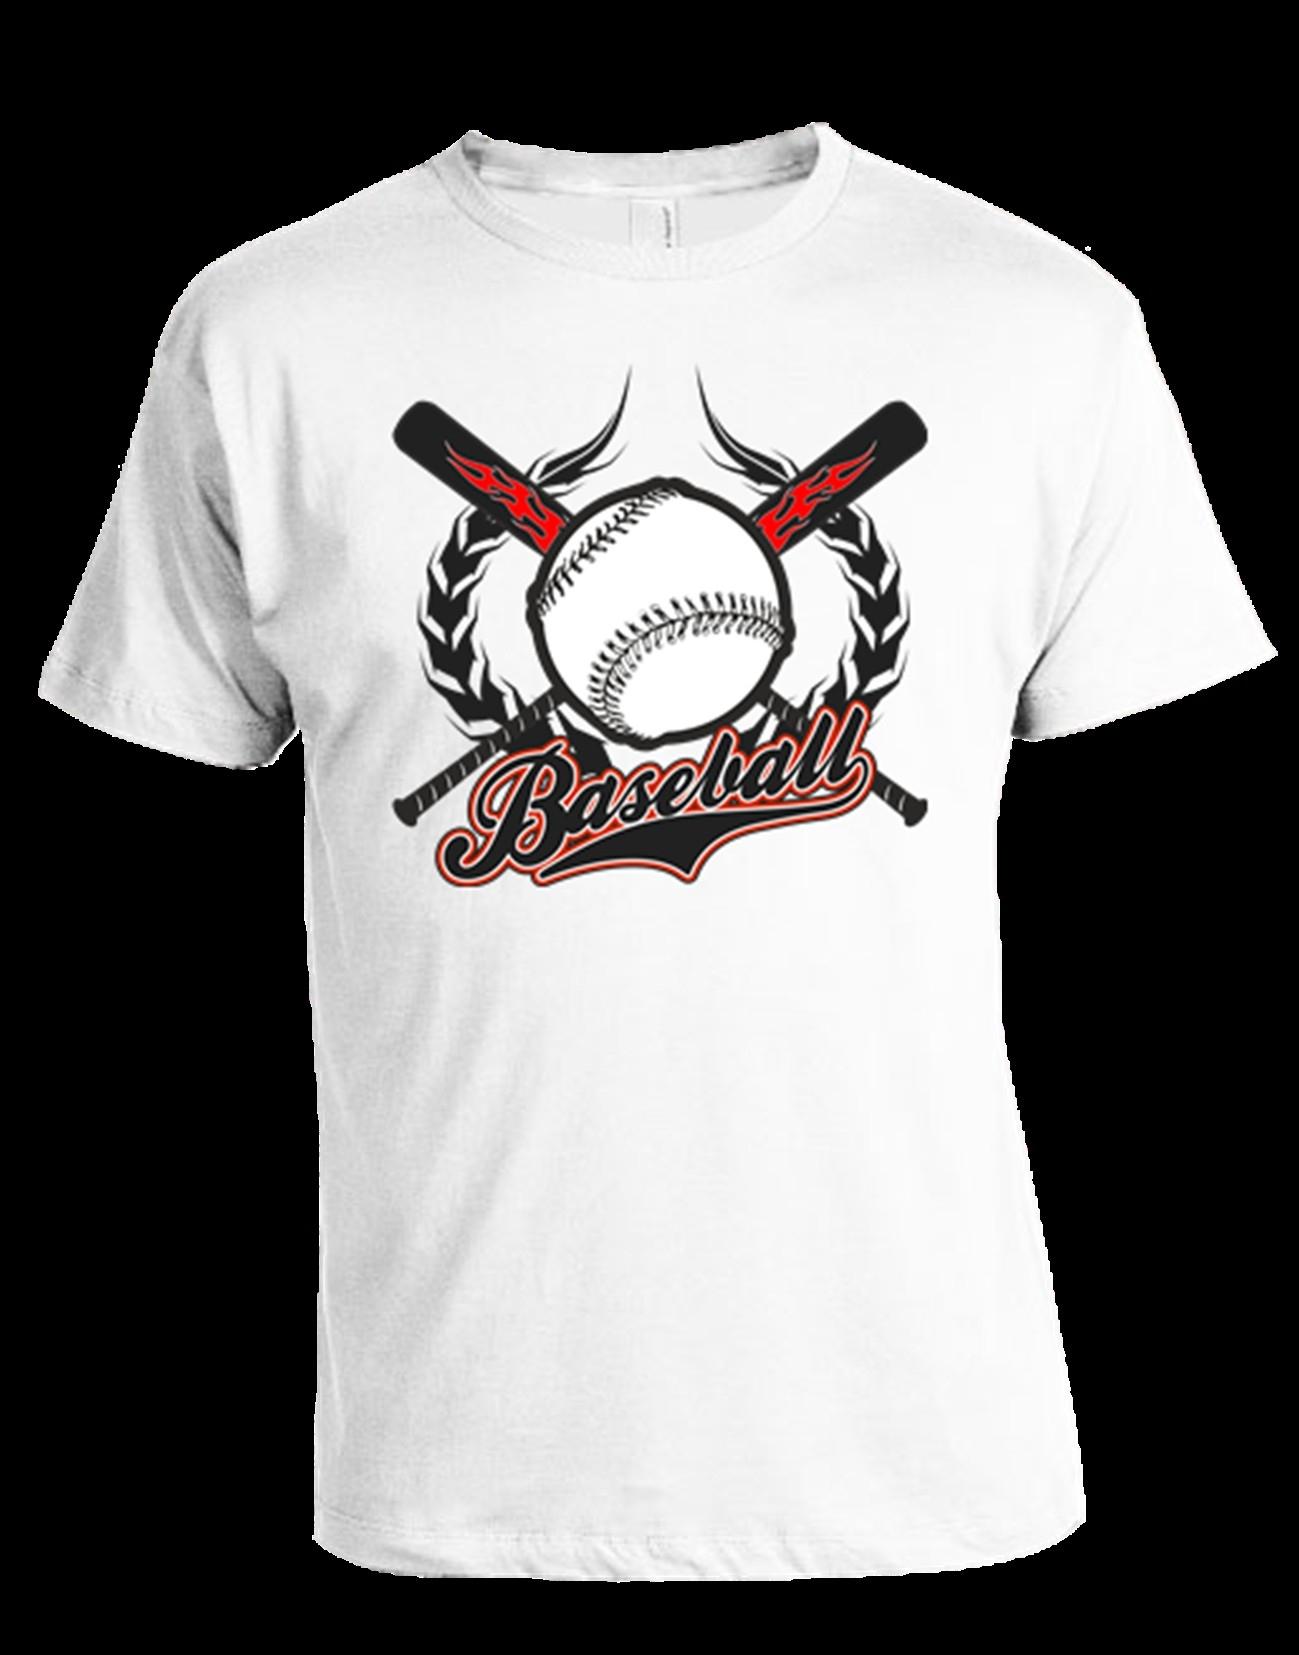 baseball t shirt designs ideas - home decor idea - weeklywarning